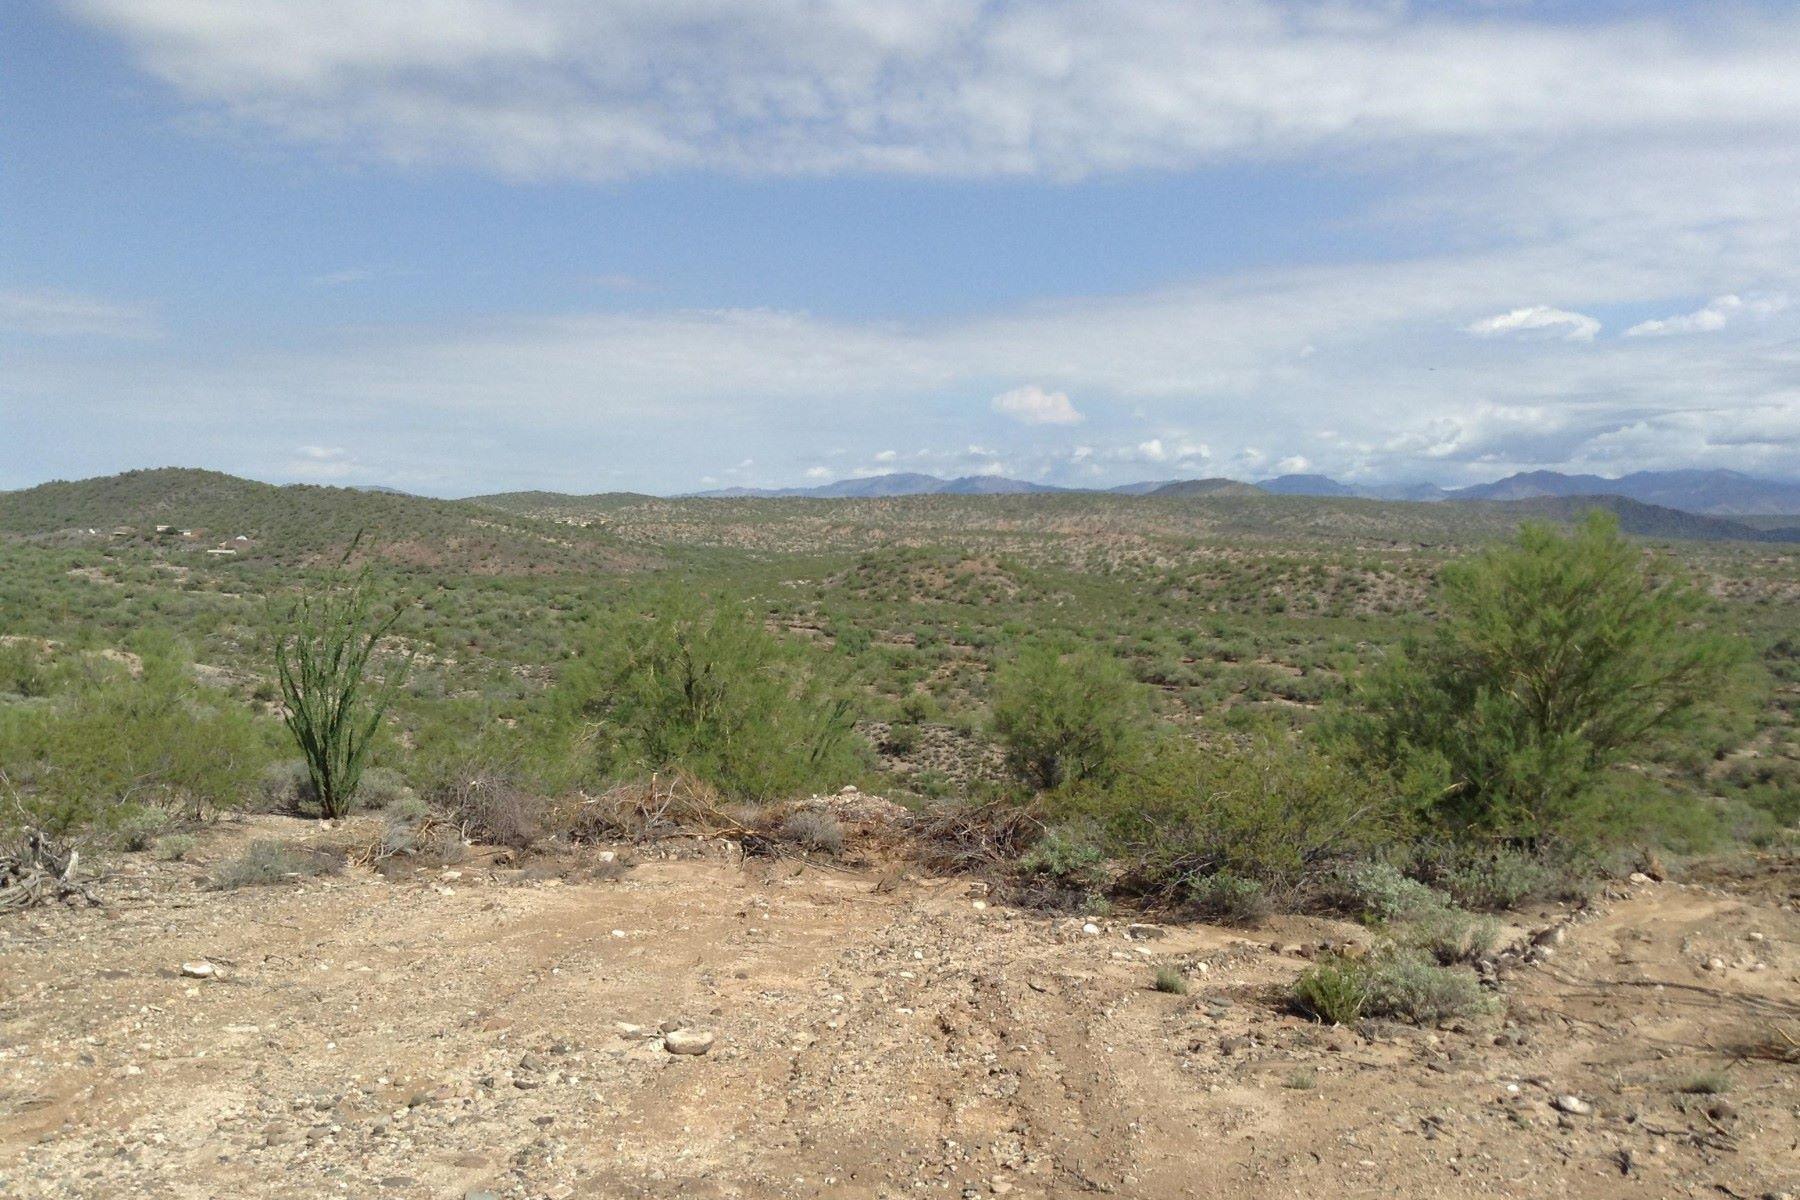 Land for Active at Wickenburg 0000 W GRANTHAM RANCH RD 201-11-005E Wickenburg, Arizona 85390 United States